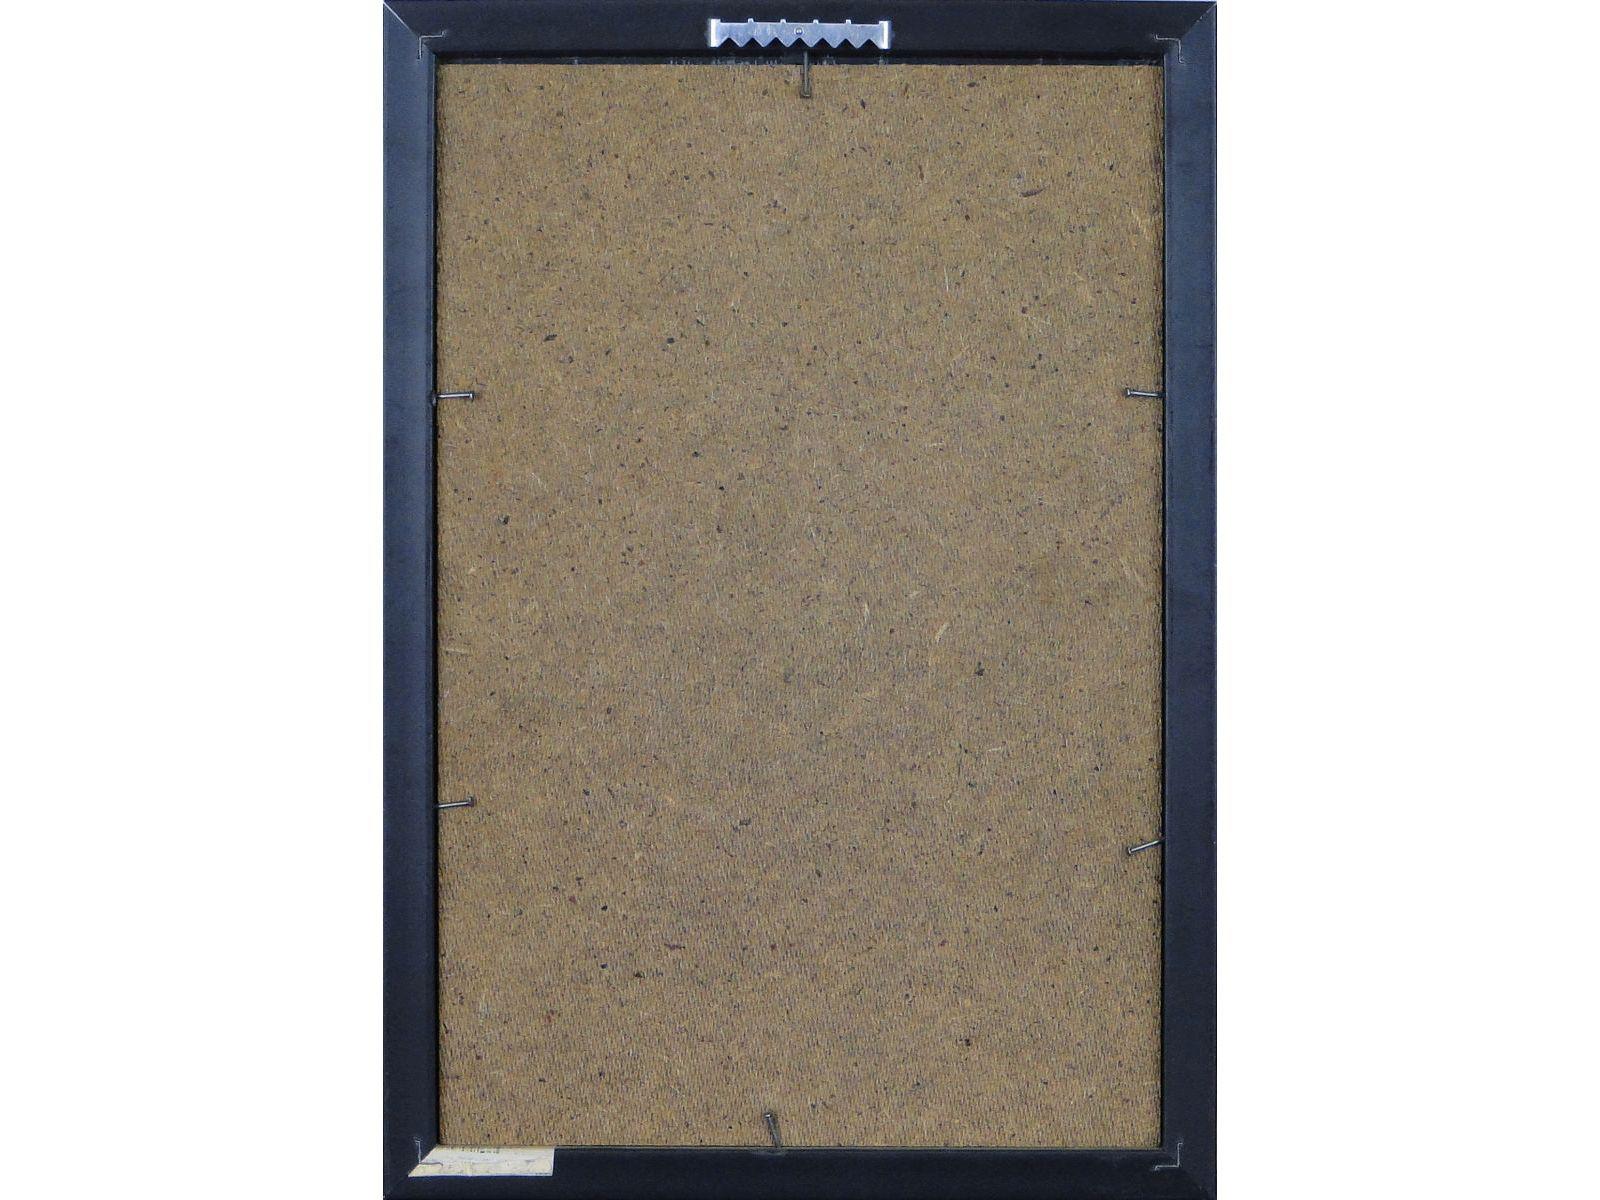 DSC04777.JPG (1600�1200)